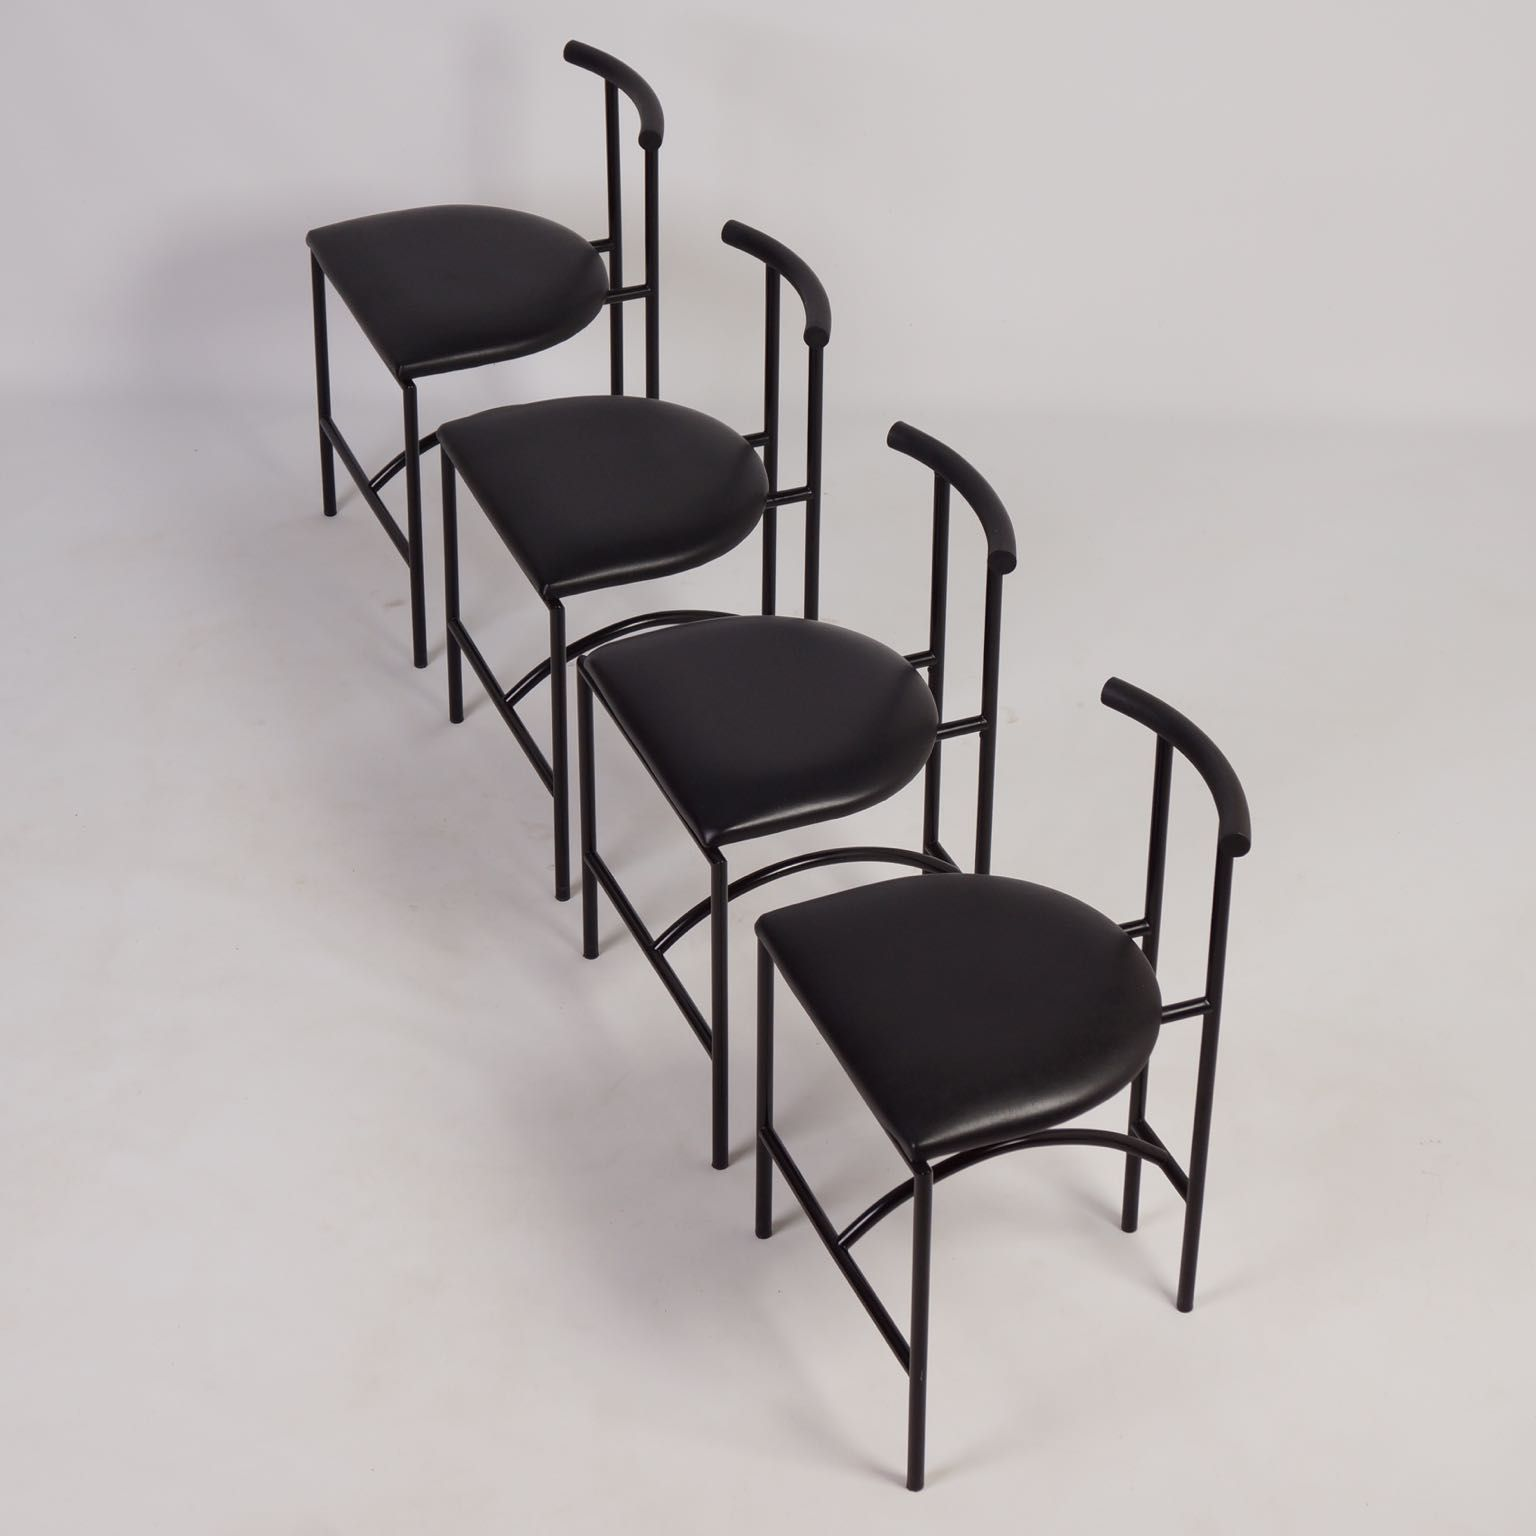 1985 Rodney Kinsman Tokyo Chair Styling HighTech 70